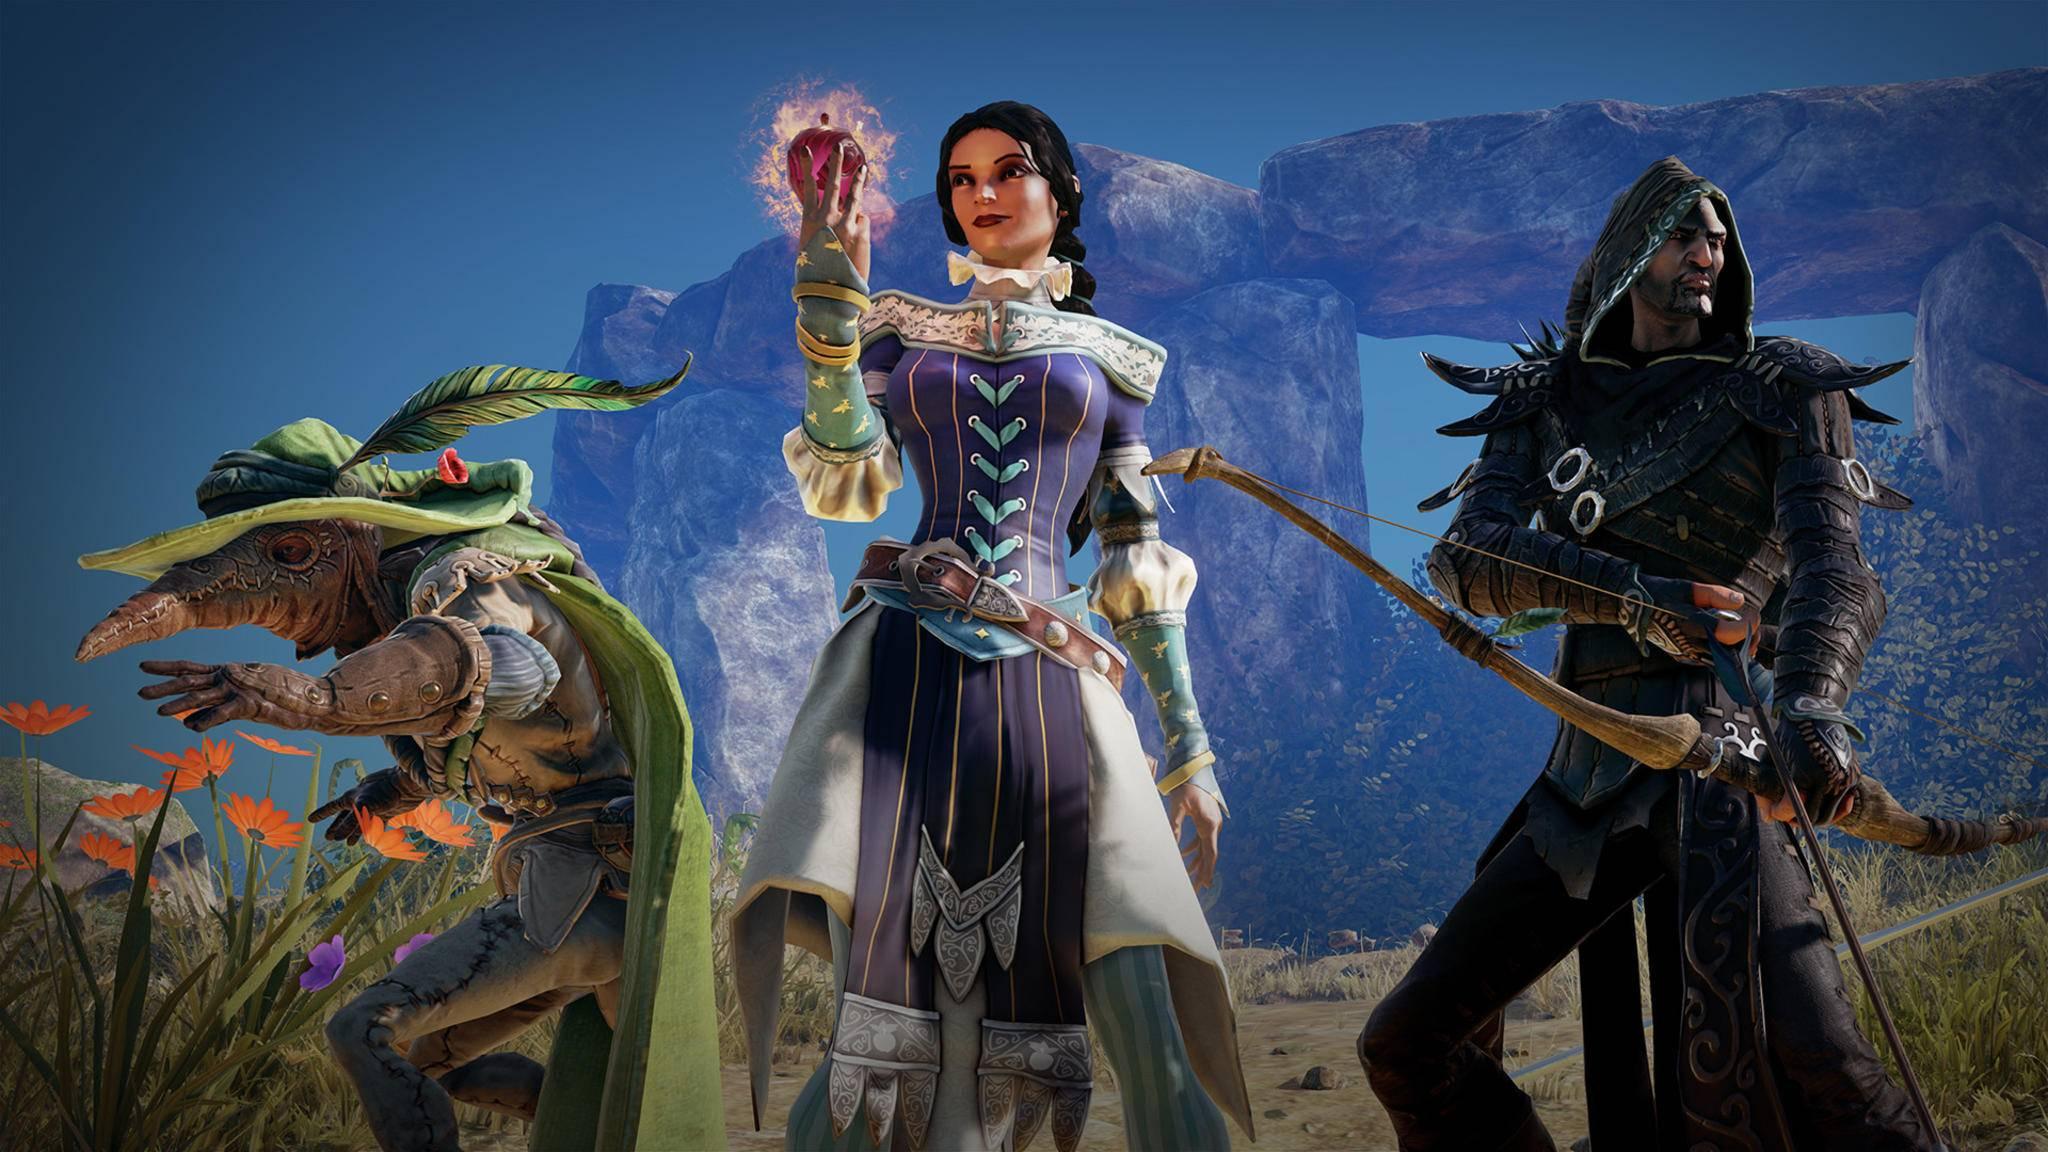 """Fable 4"" taucht bei Mixer auf: Offizielle Ankündigung zur E3 2019?"